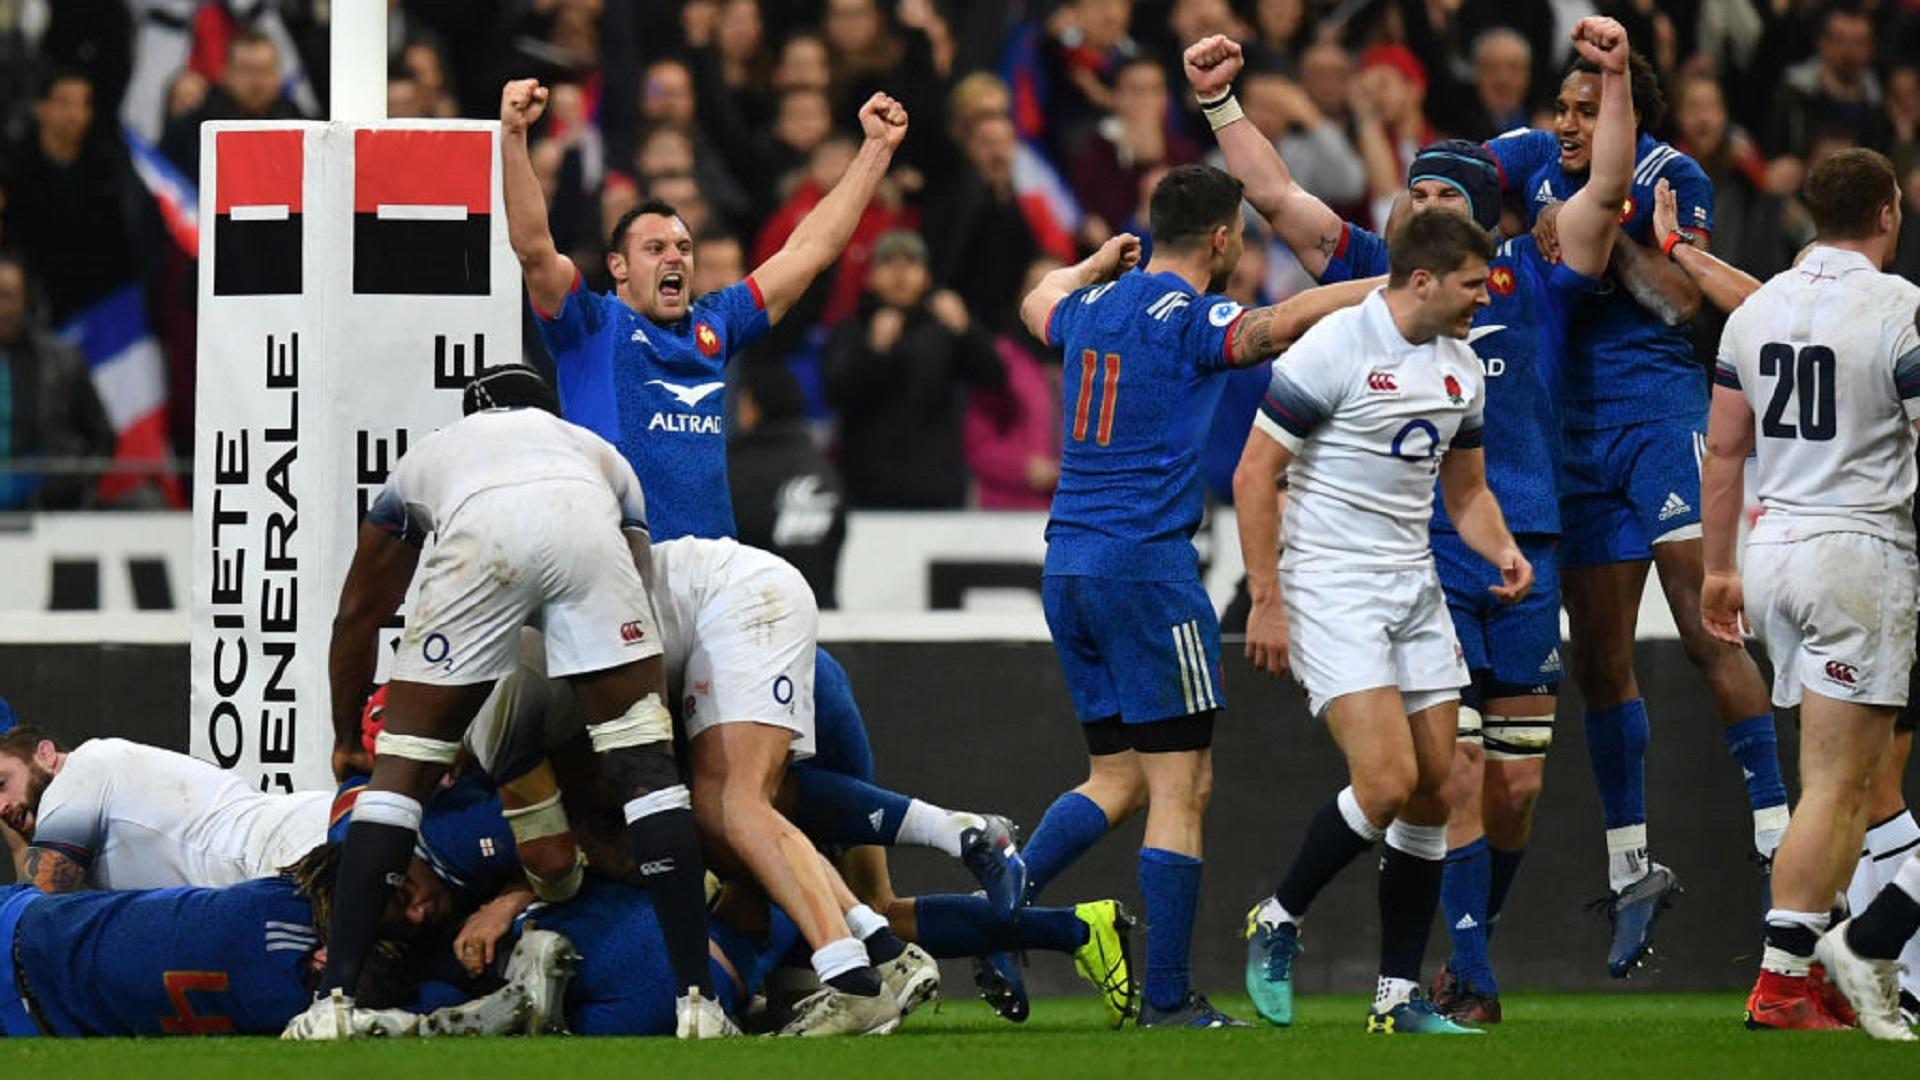 France vs England RWC 2019